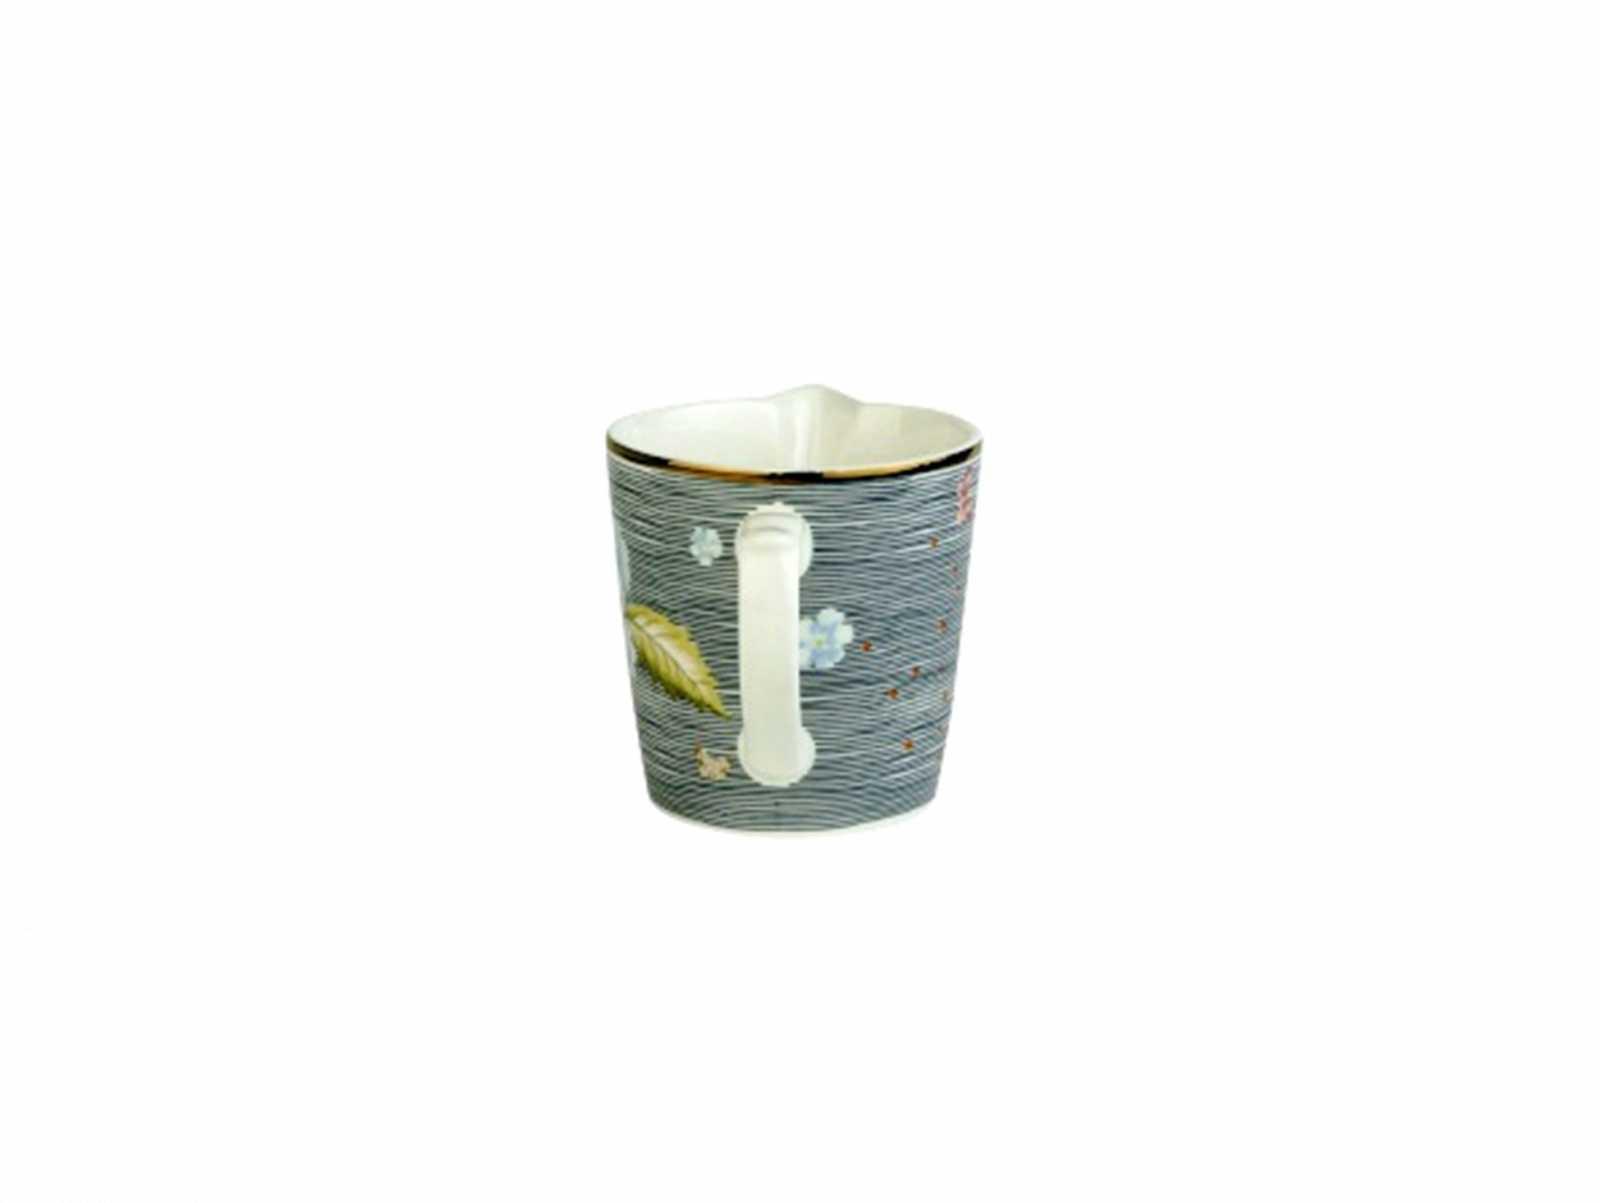 Онлайн каталог PROMENU: Молочник Laura Ashley HERITAGE, белый в синюю полоску с цветами                               180969